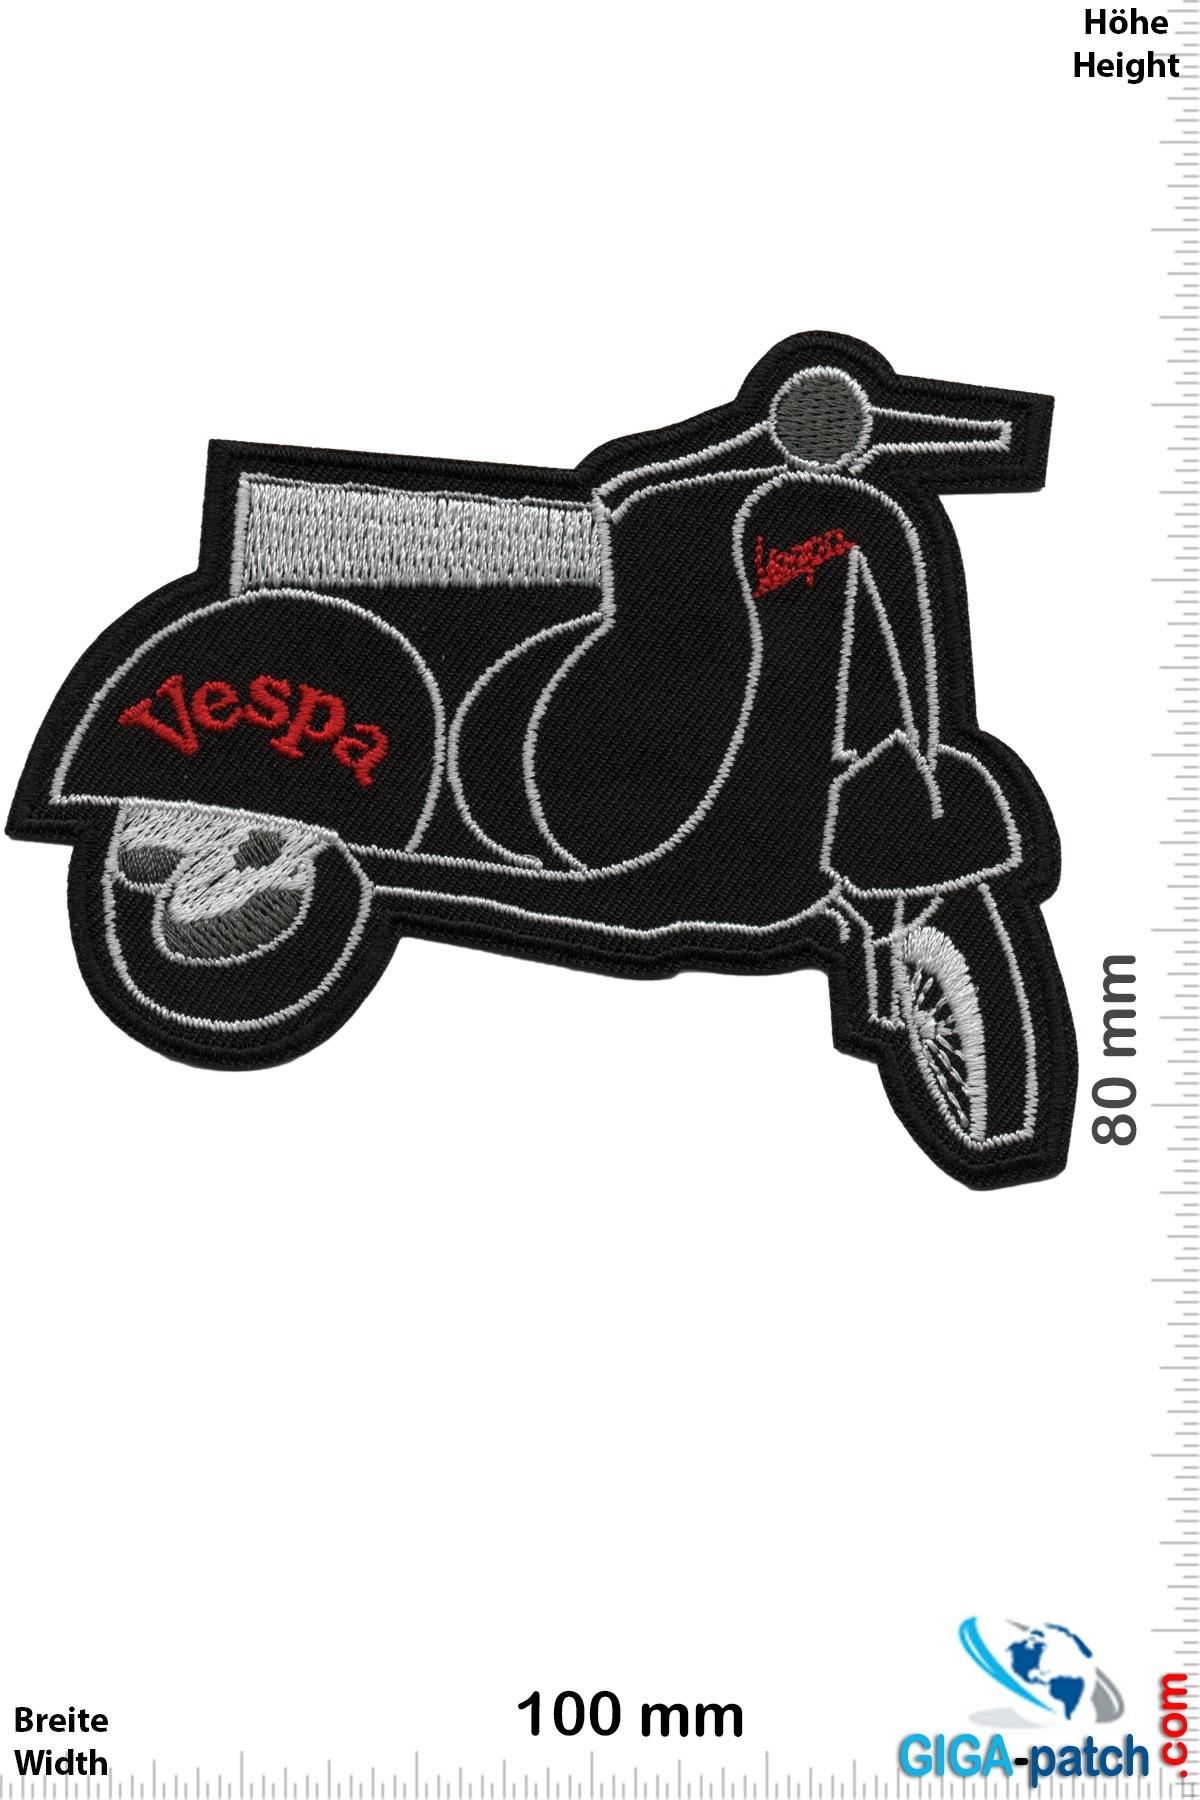 Vespa Vespa - silver black - Scooter